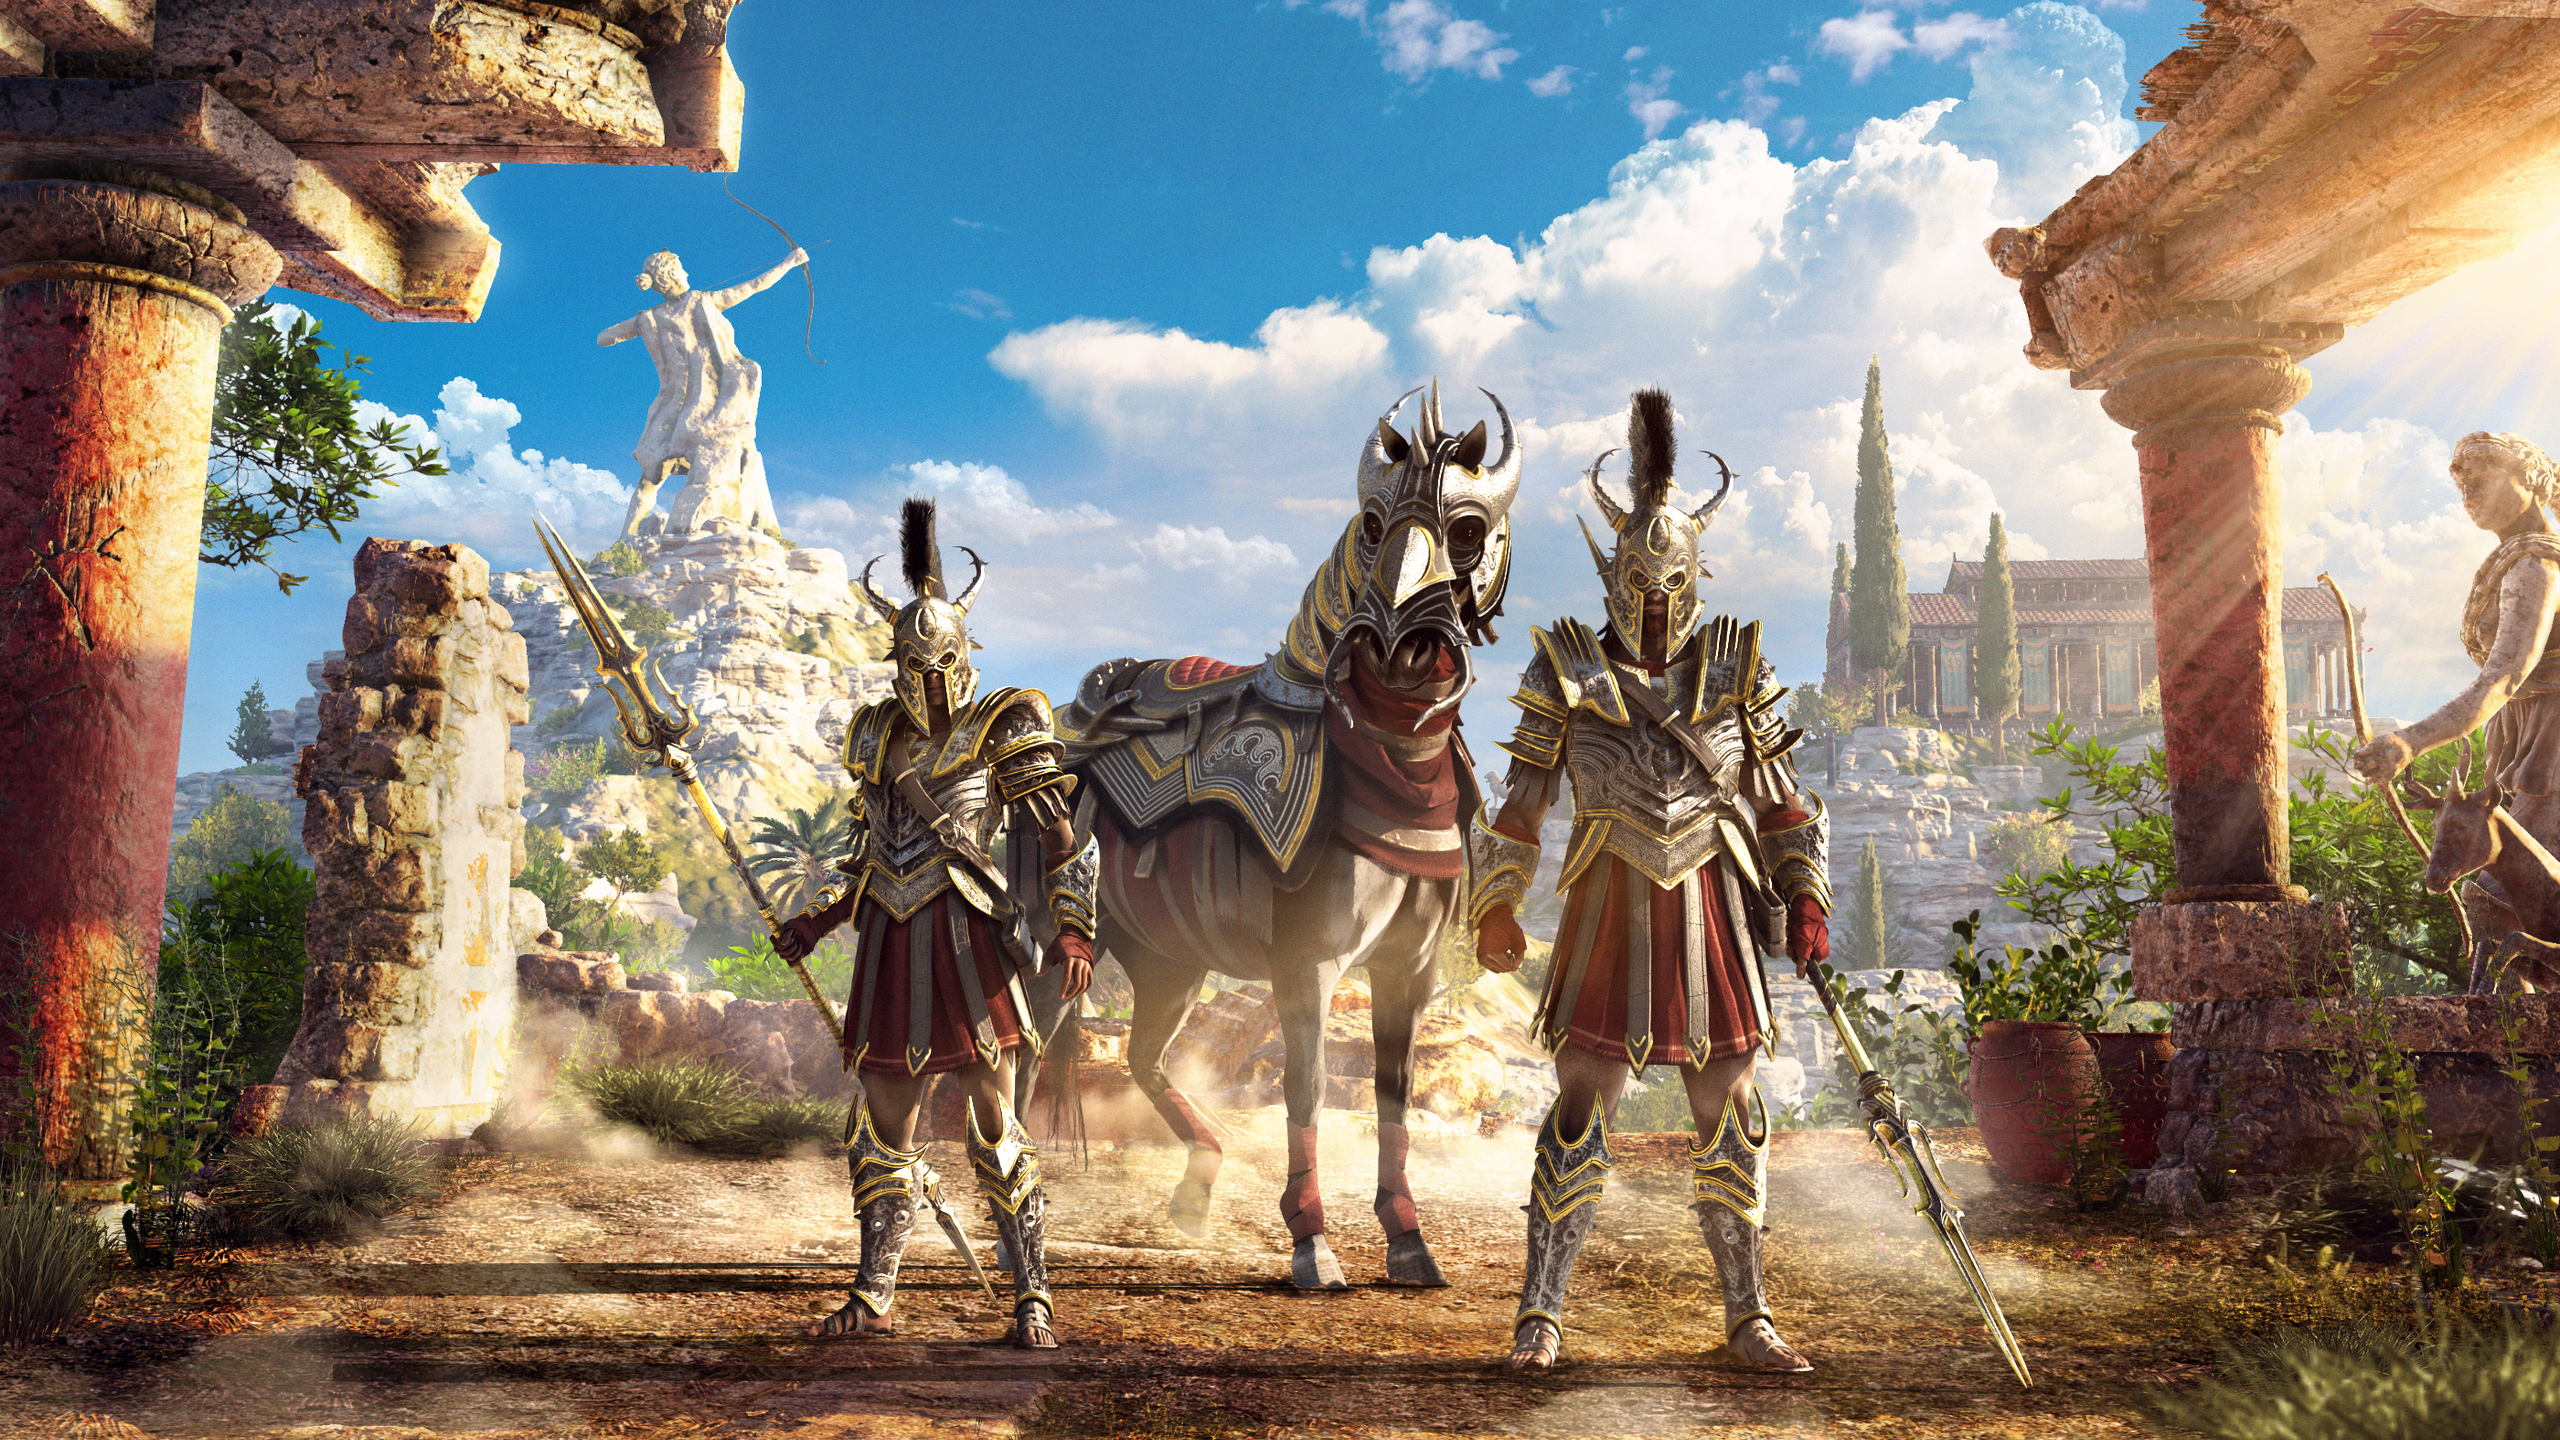 2560x1440 2019 Assassins Creed Odyssey 1440P Resolution HD ...